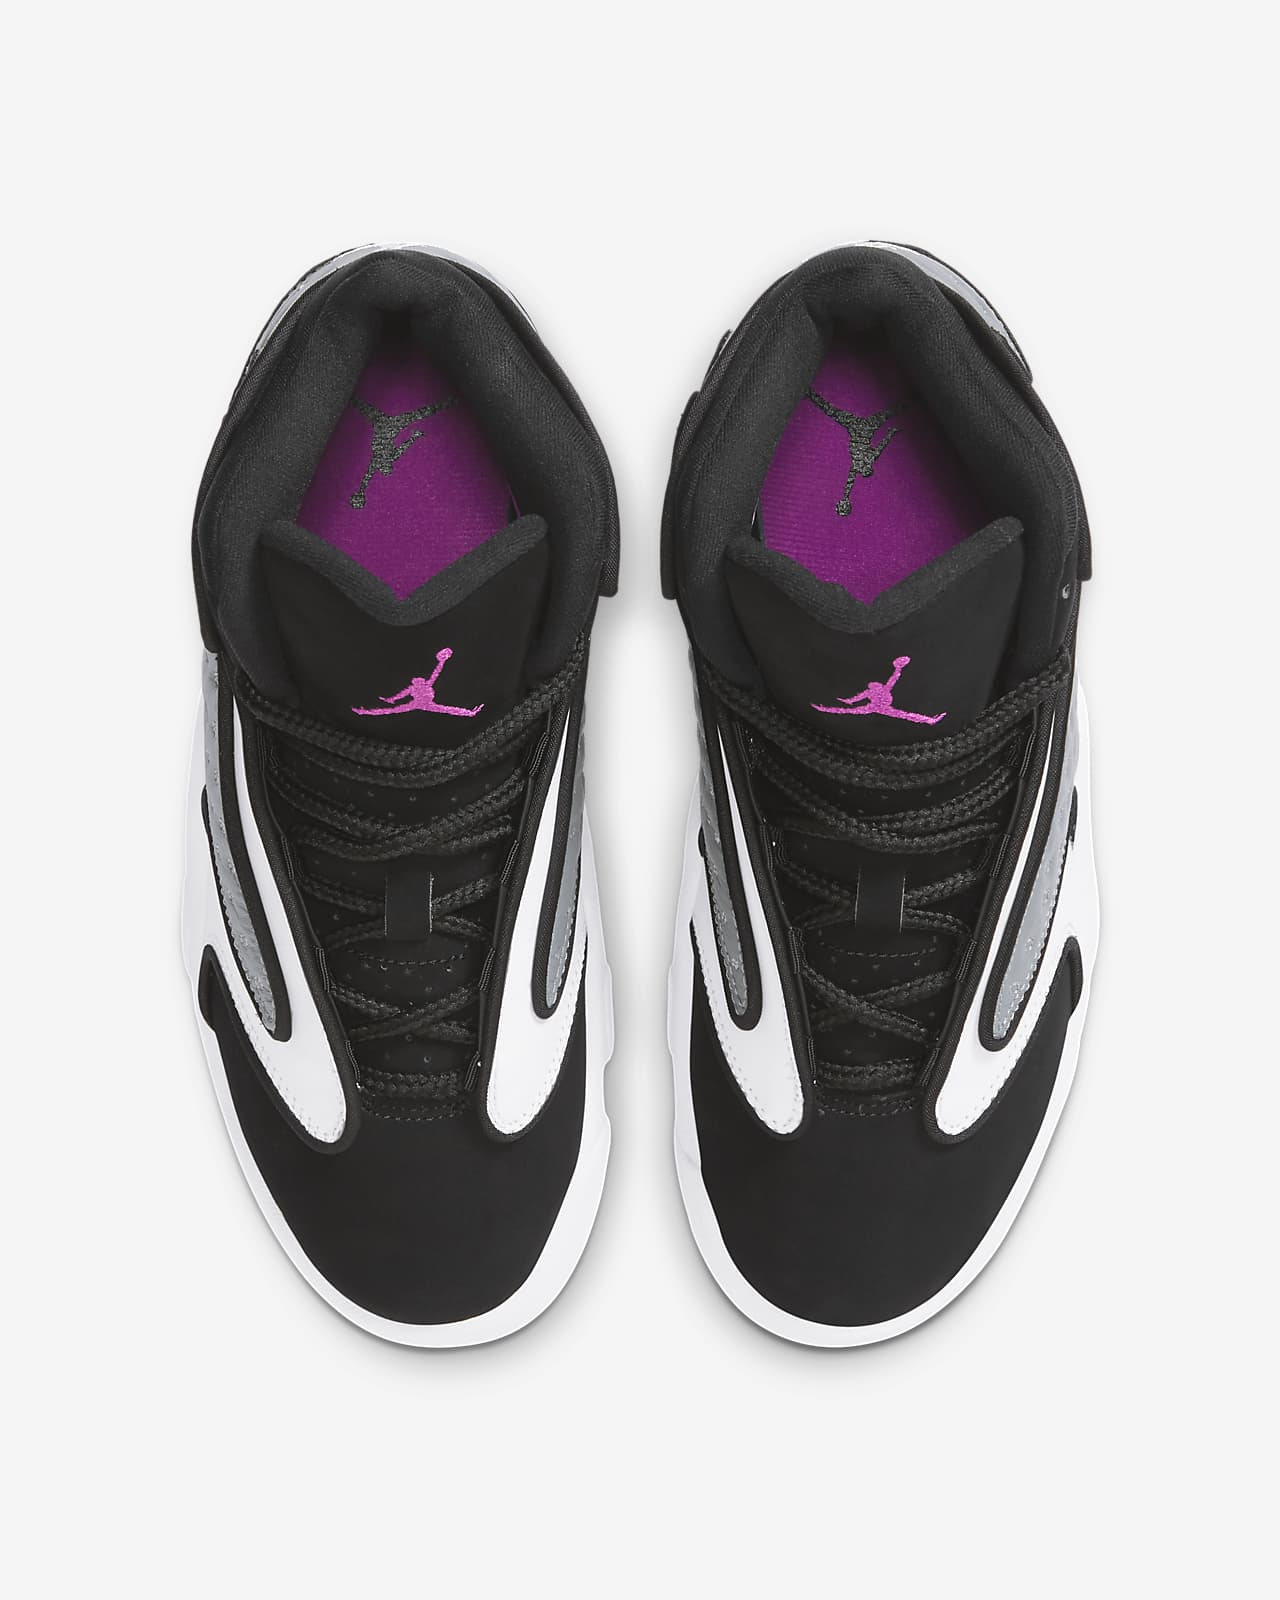 nike jordan womens shoes